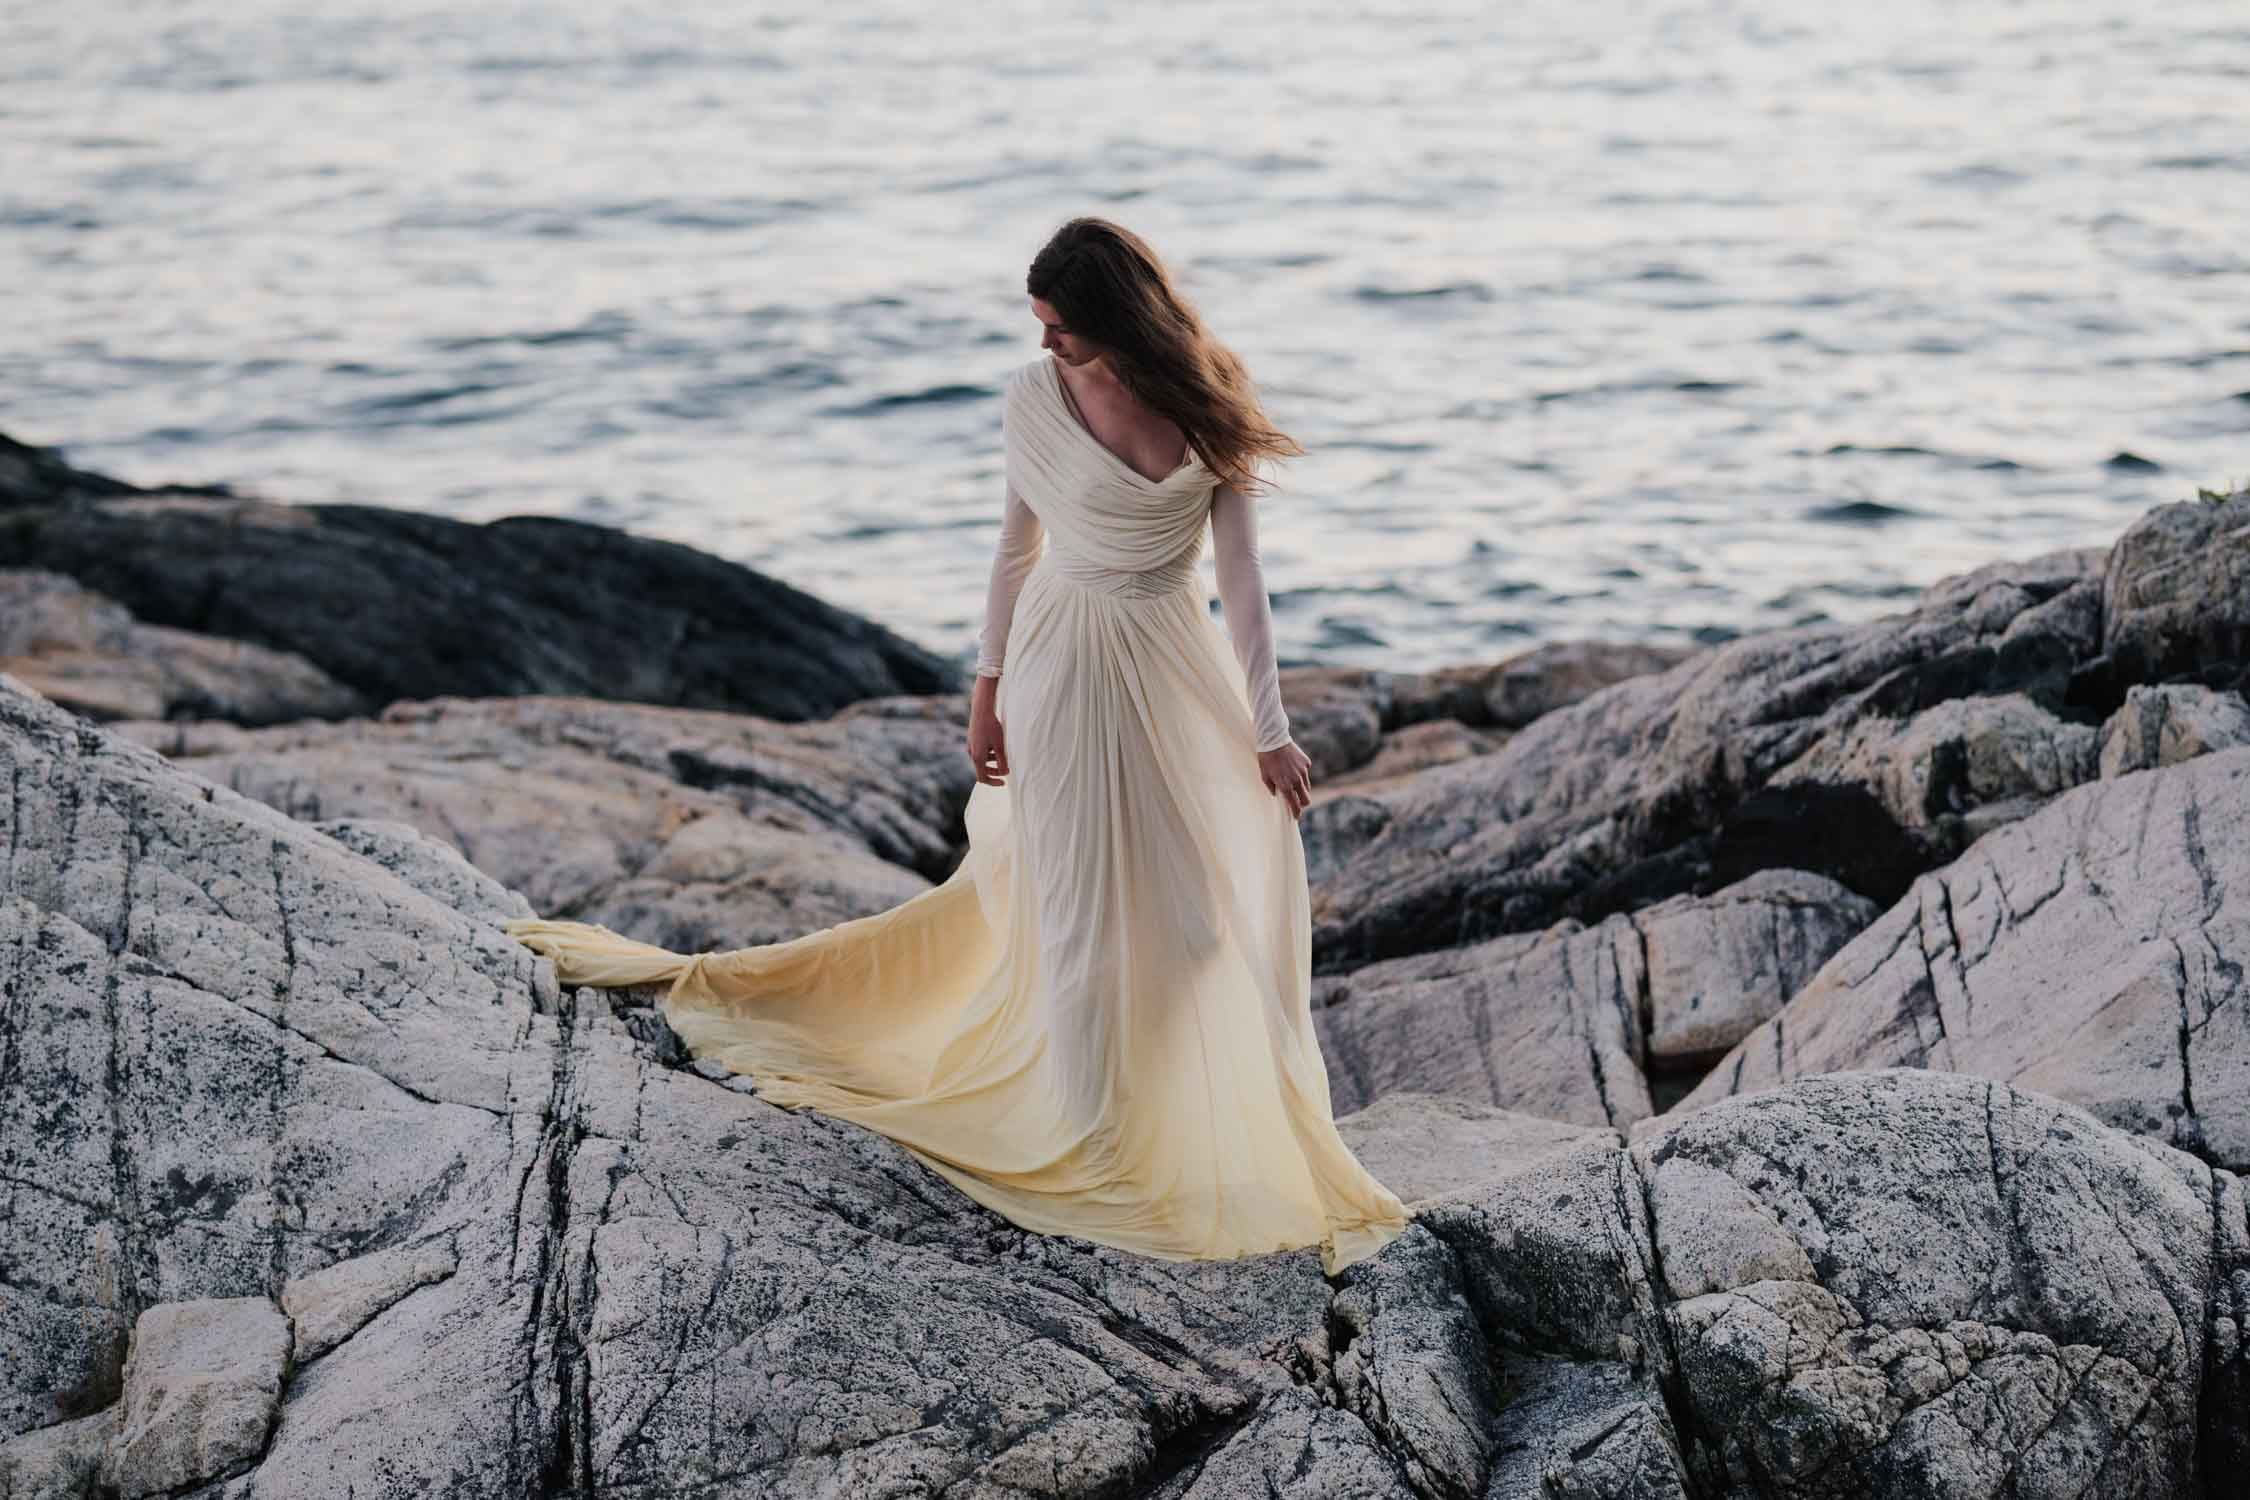 Wedding Portrait Photo Shoot At Seaside Beach Rocks North Vancouver